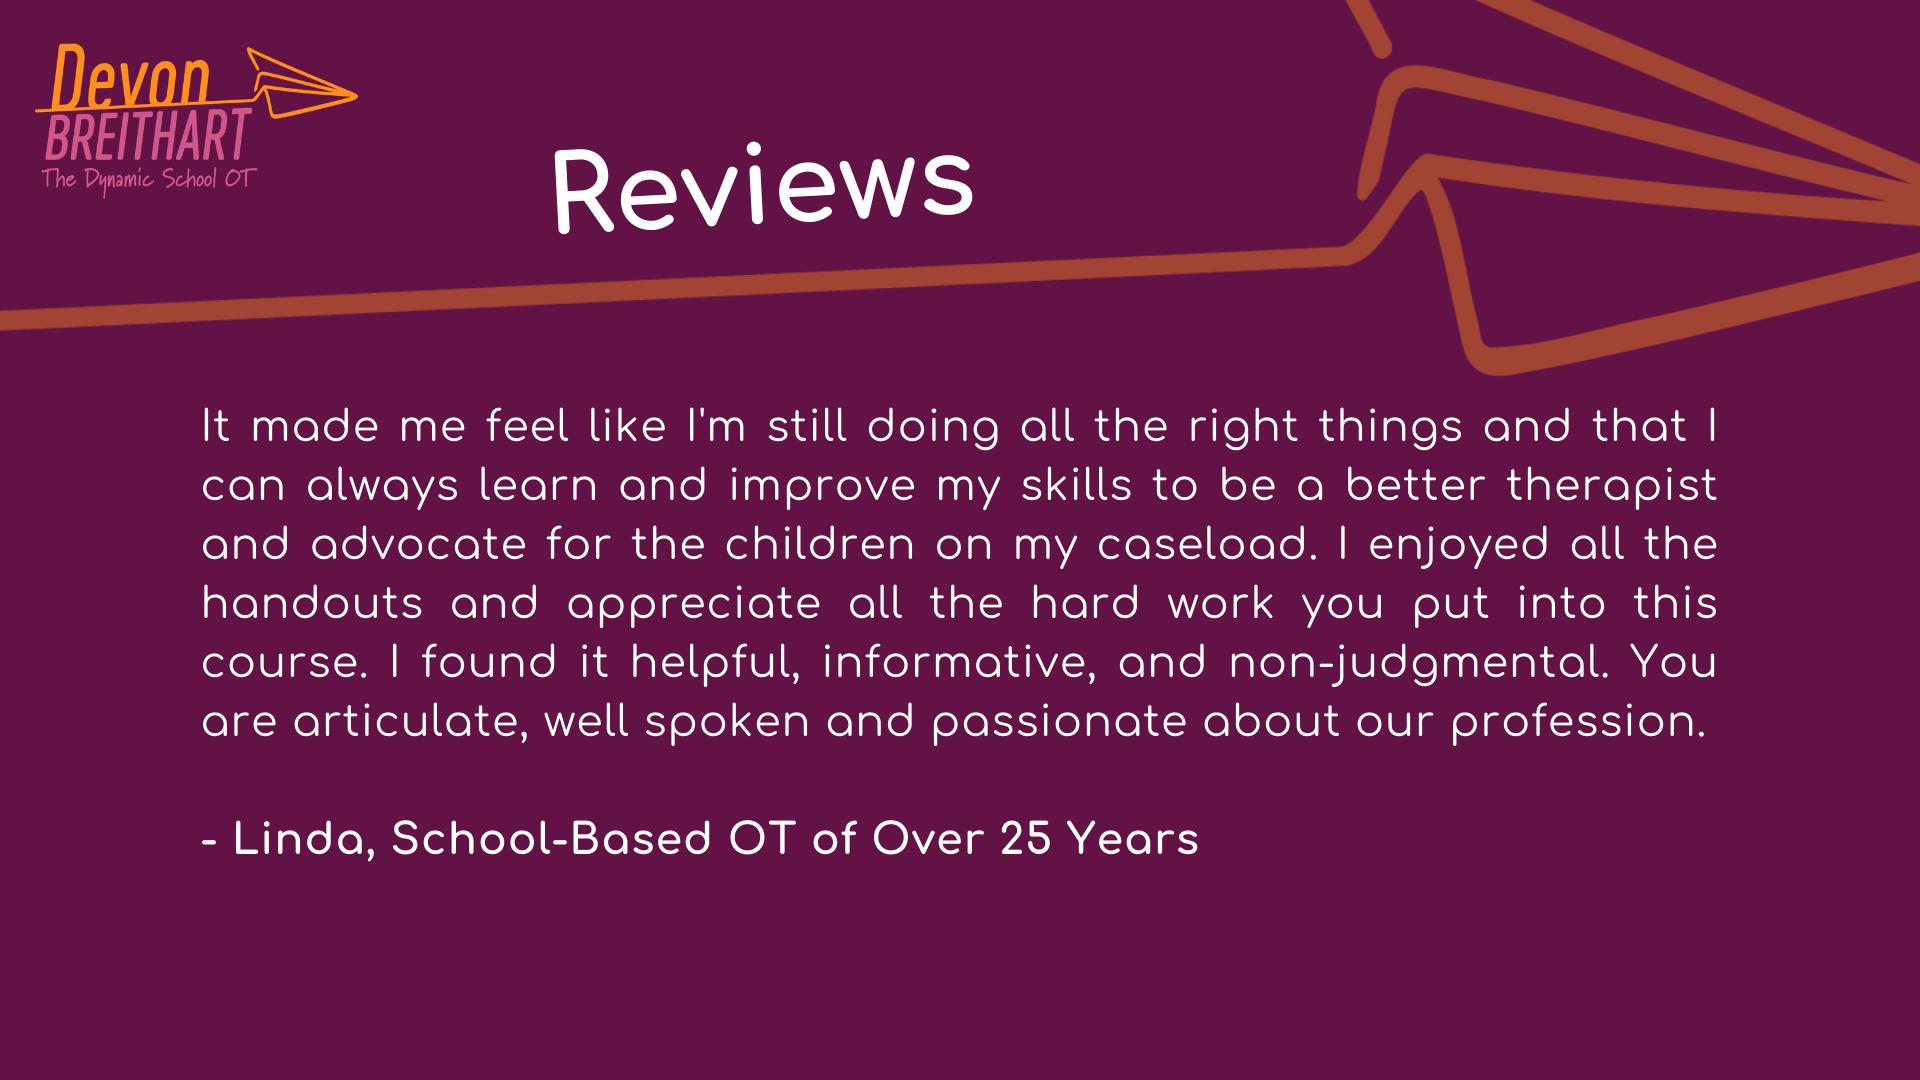 The Dynamic School OT Testimonial